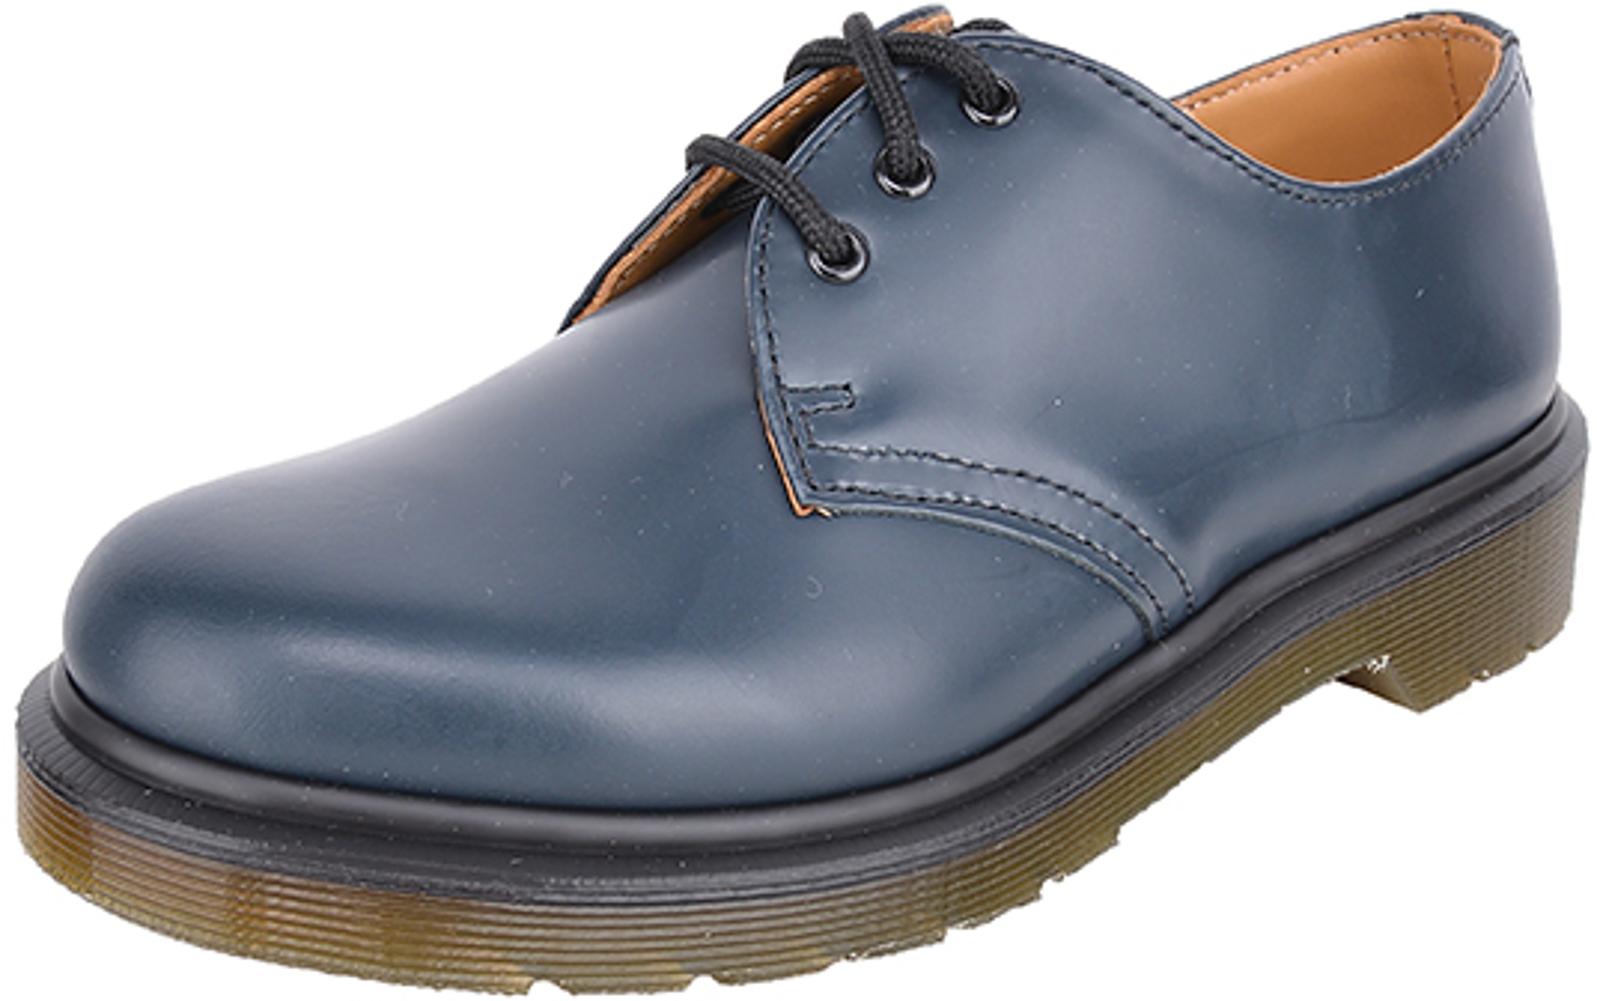 Begrenzt Klassisch Dr Martens 1461 3 Eye Schuhe (Herren) Dr